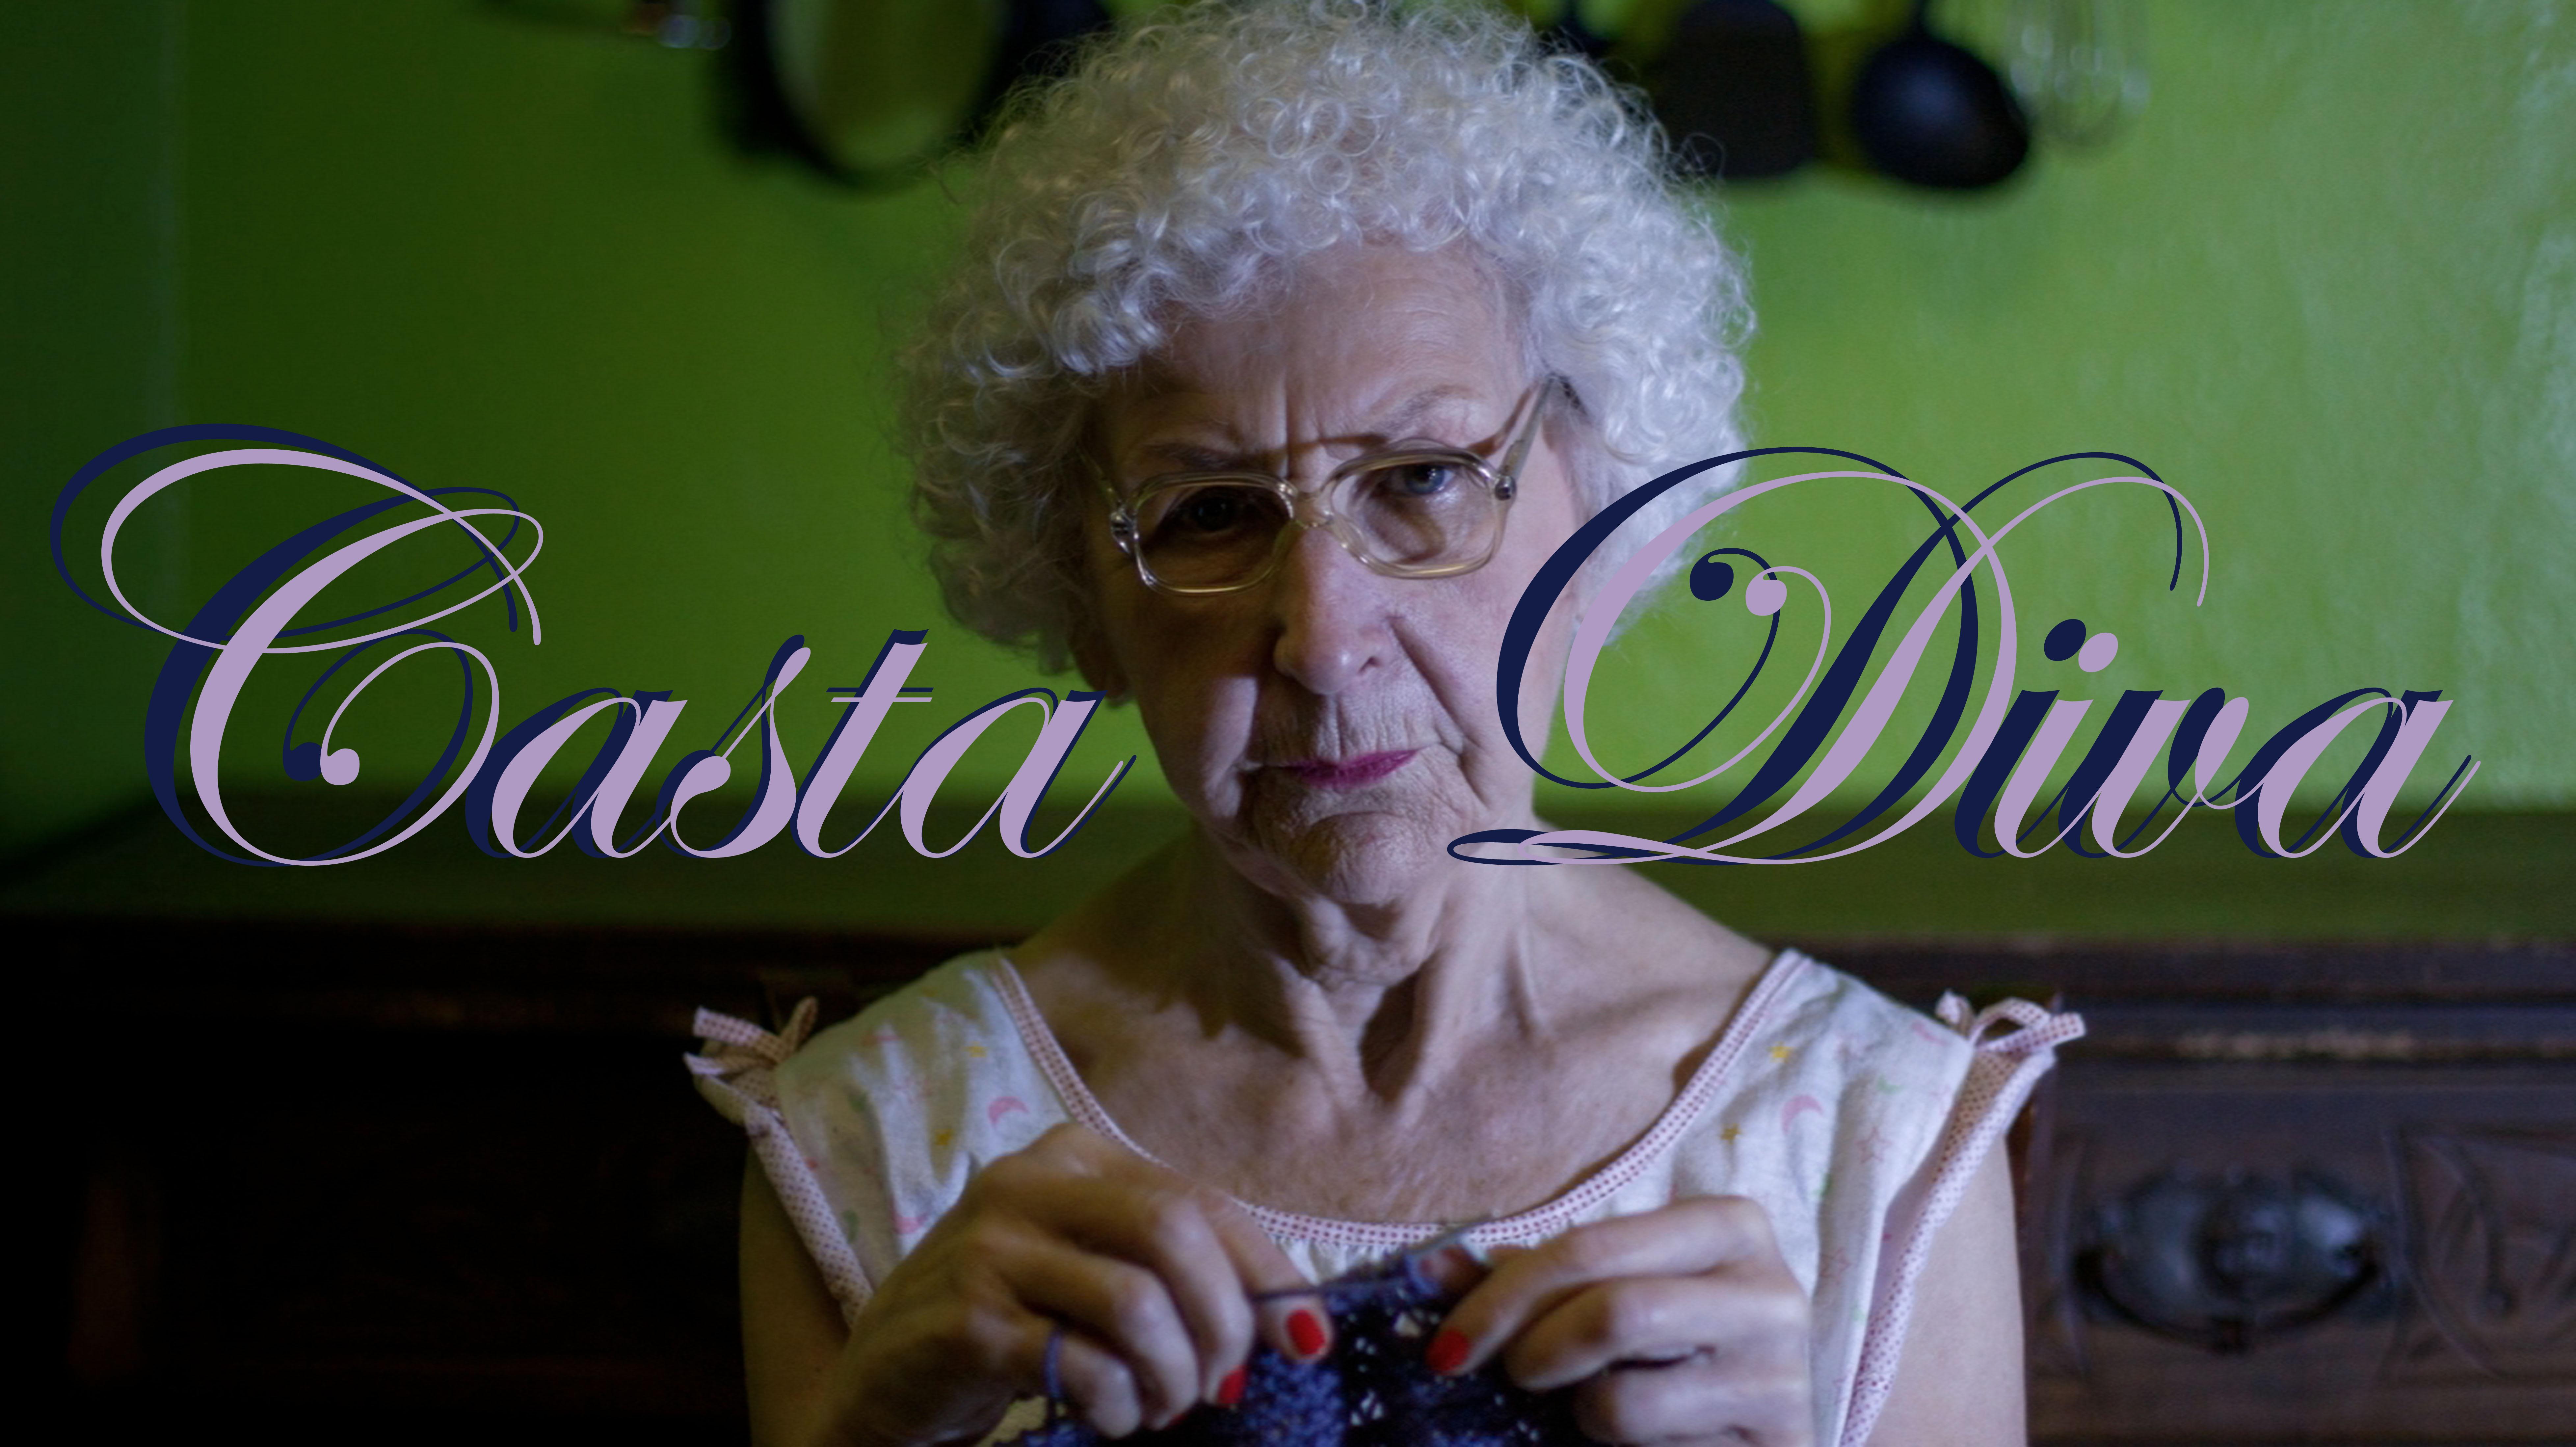 Casta diva - Casta diva film ...